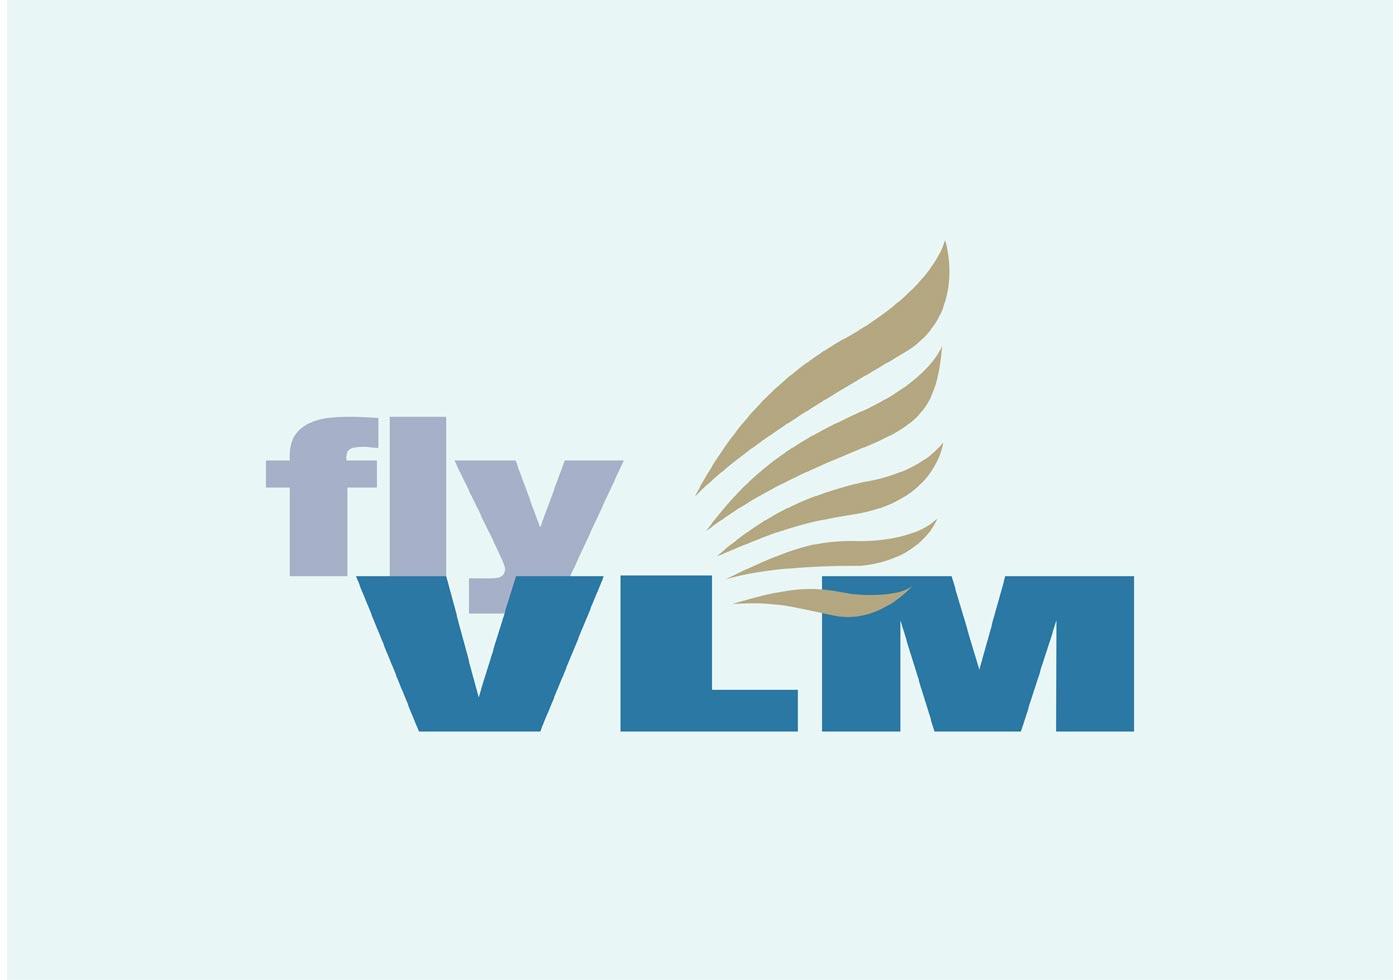 vlm airlines download free vector art stock graphics